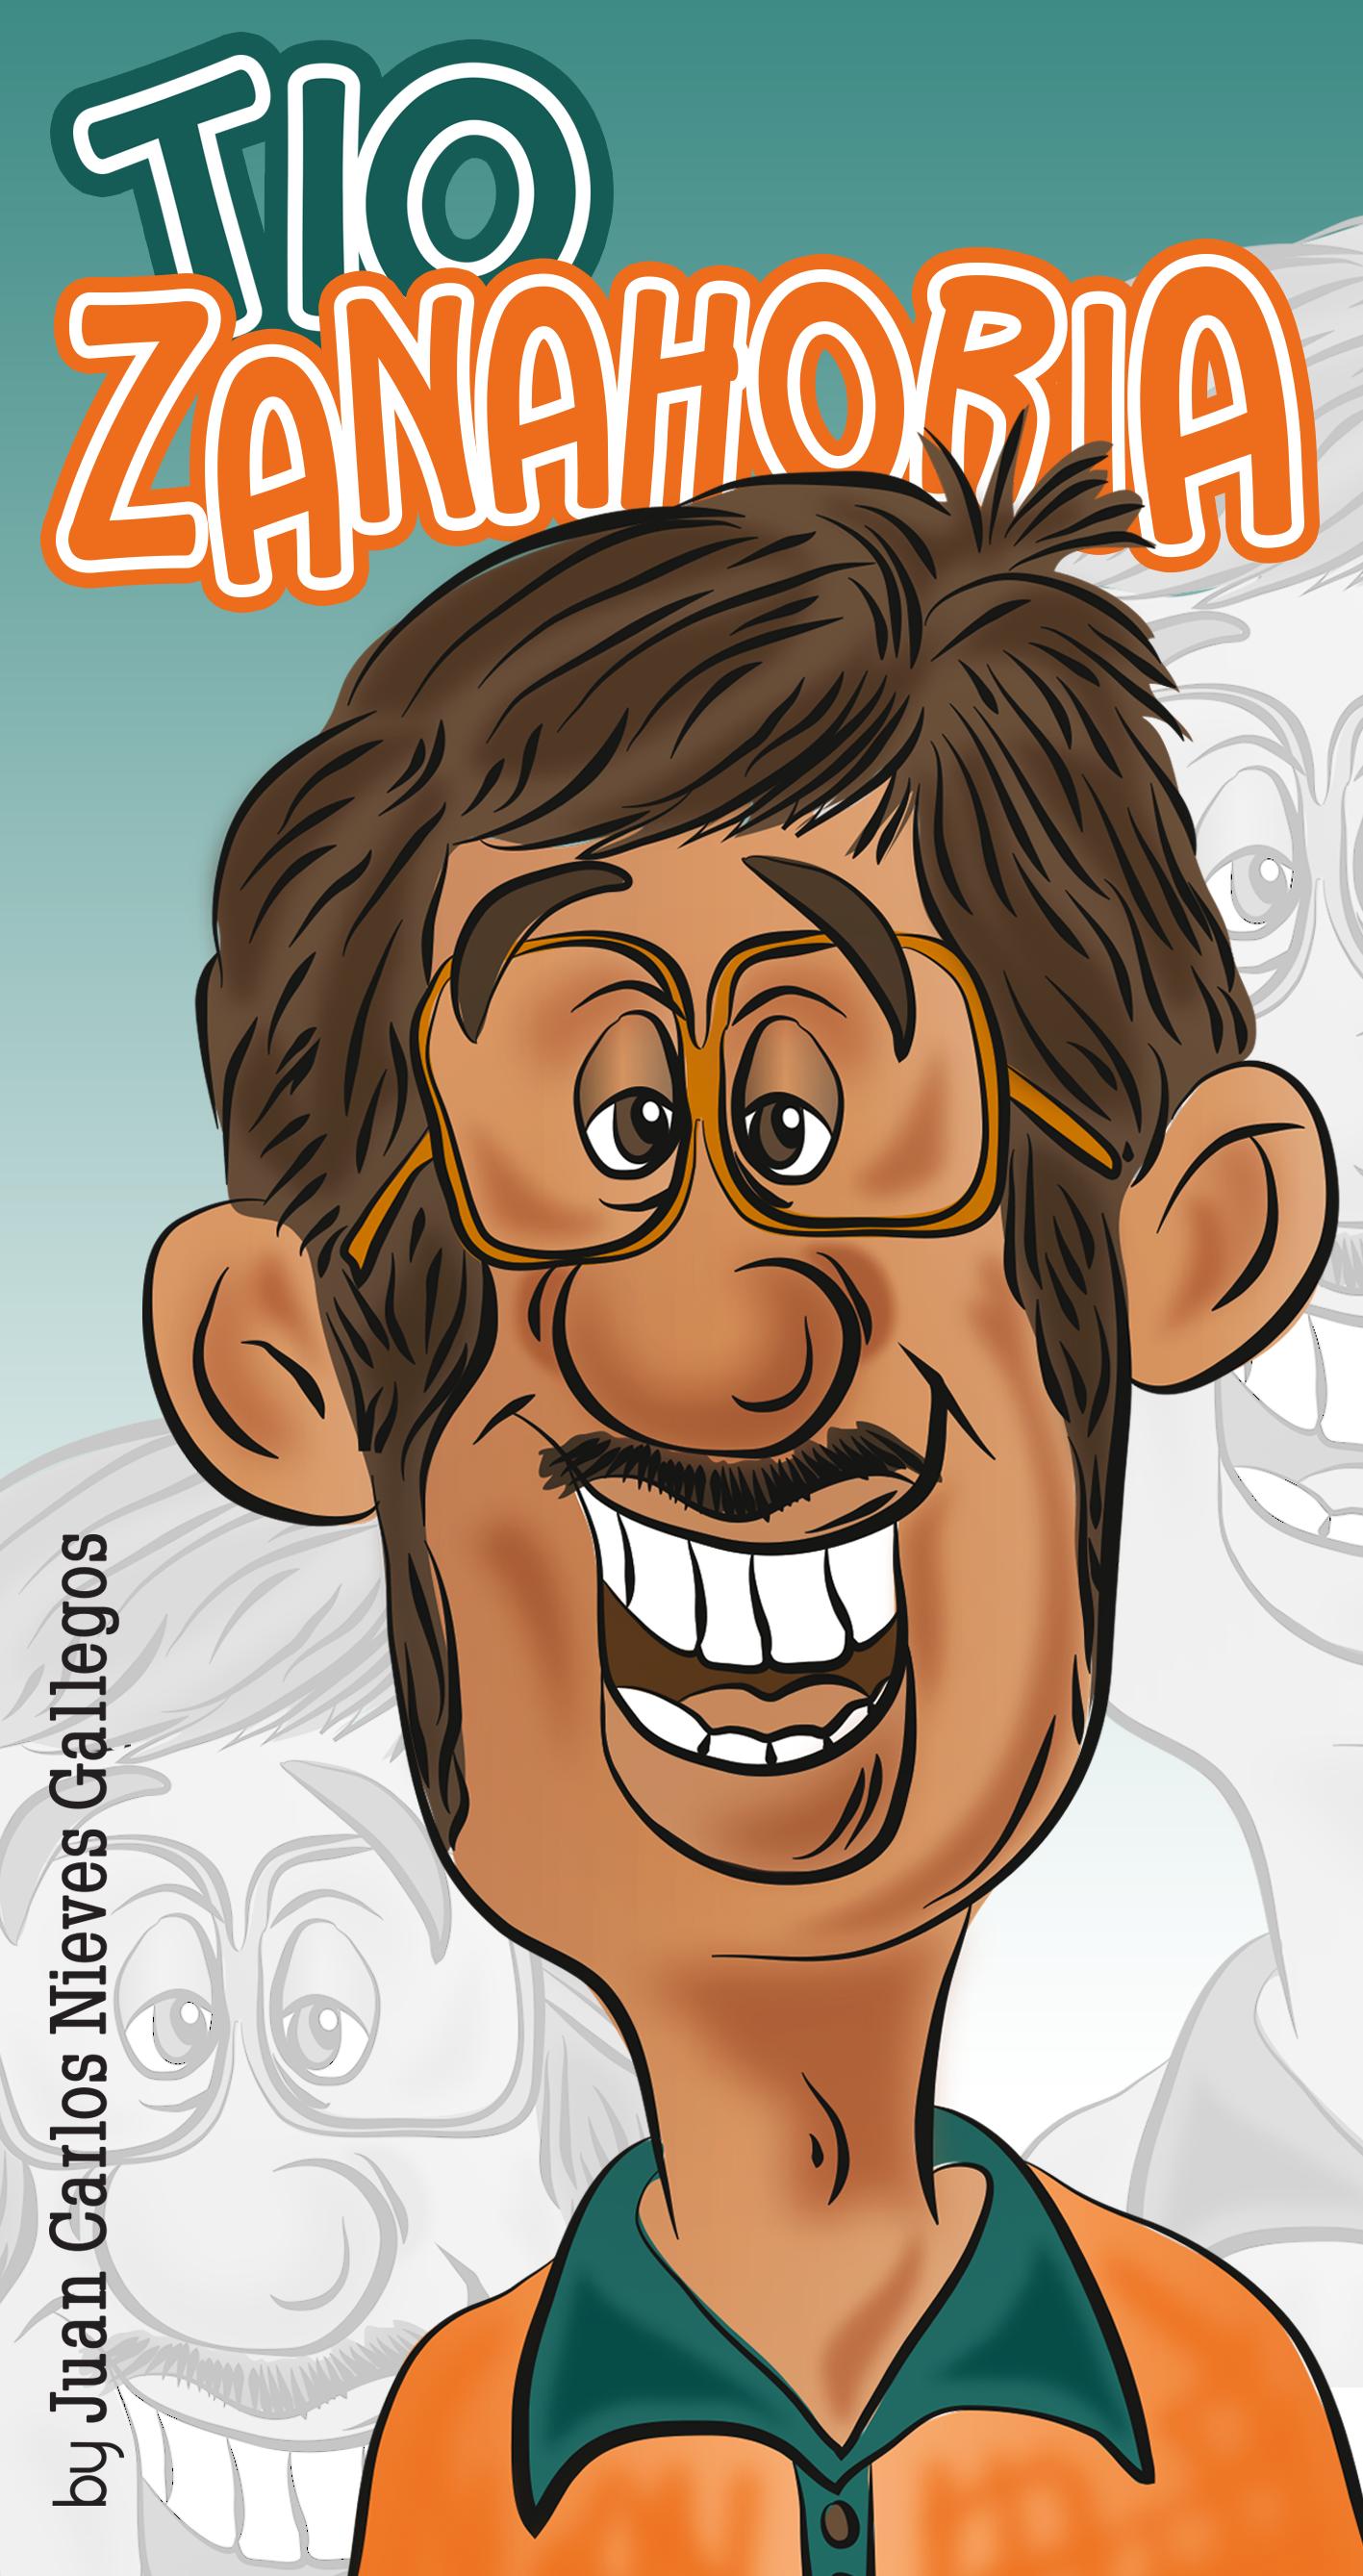 Tio Zanahoria Caricatura Cartoon Doodle Comic Book Cover Book Cover Comics Последние твиты от maría zanahoria (@hizanahoria). tio zanahoria caricatura cartoon